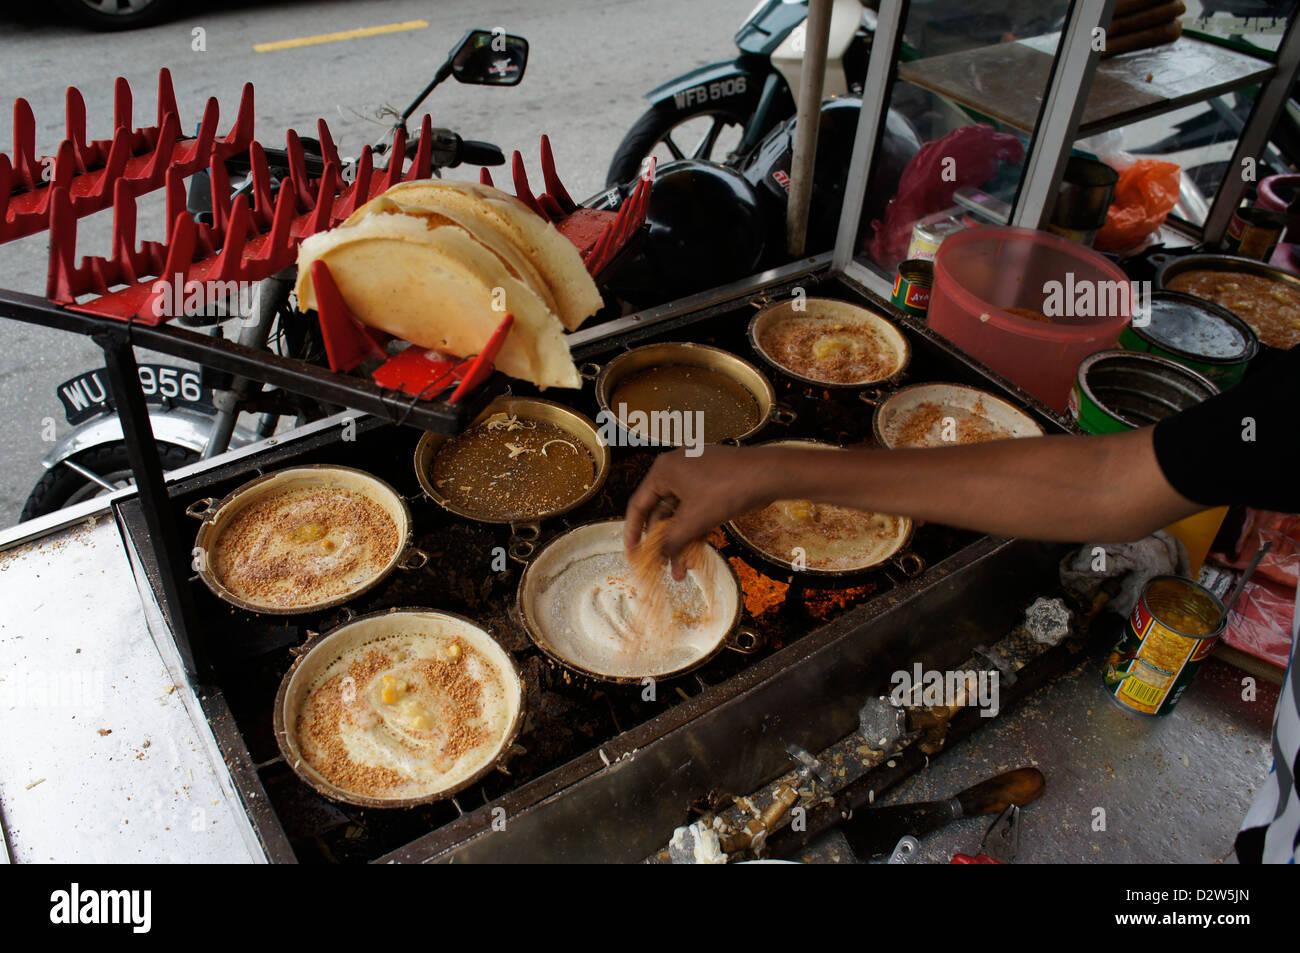 hawker making Apam balik (turnover pancake) Malaysian pancake with sugar, peanuts and creamy sweet corn fillings - Stock Image